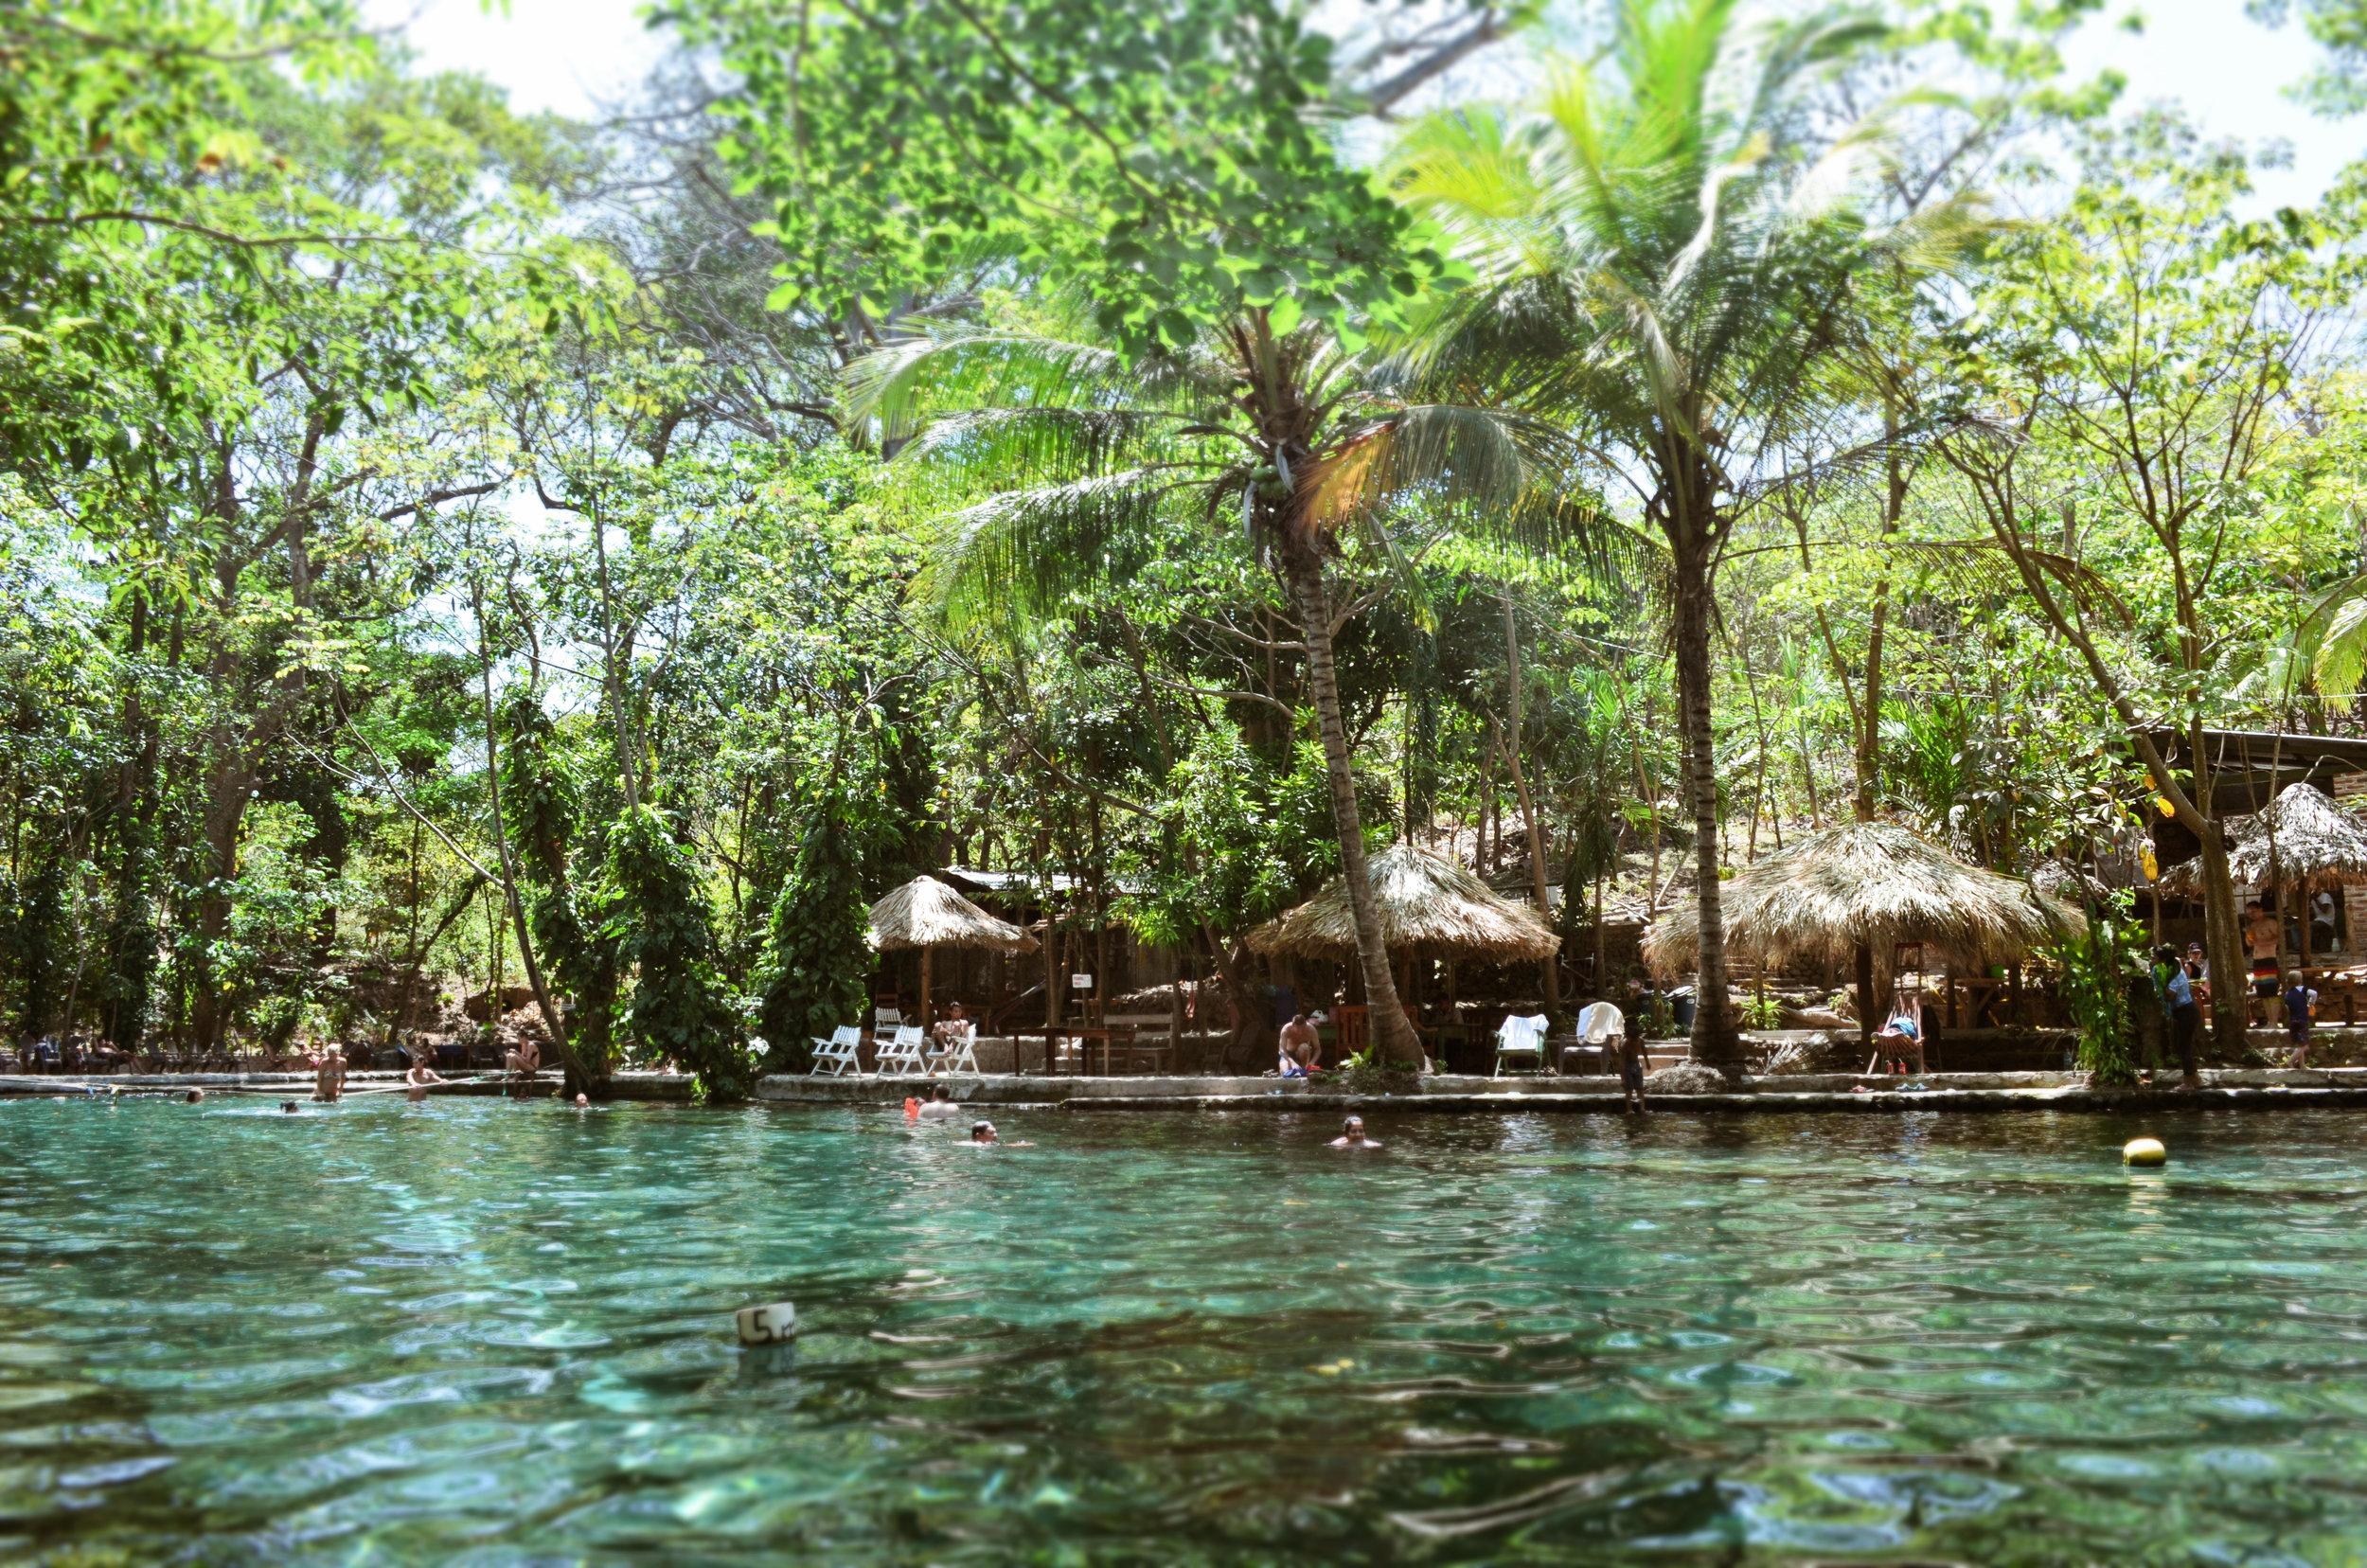 The swimming pool at Ojo de Agua.